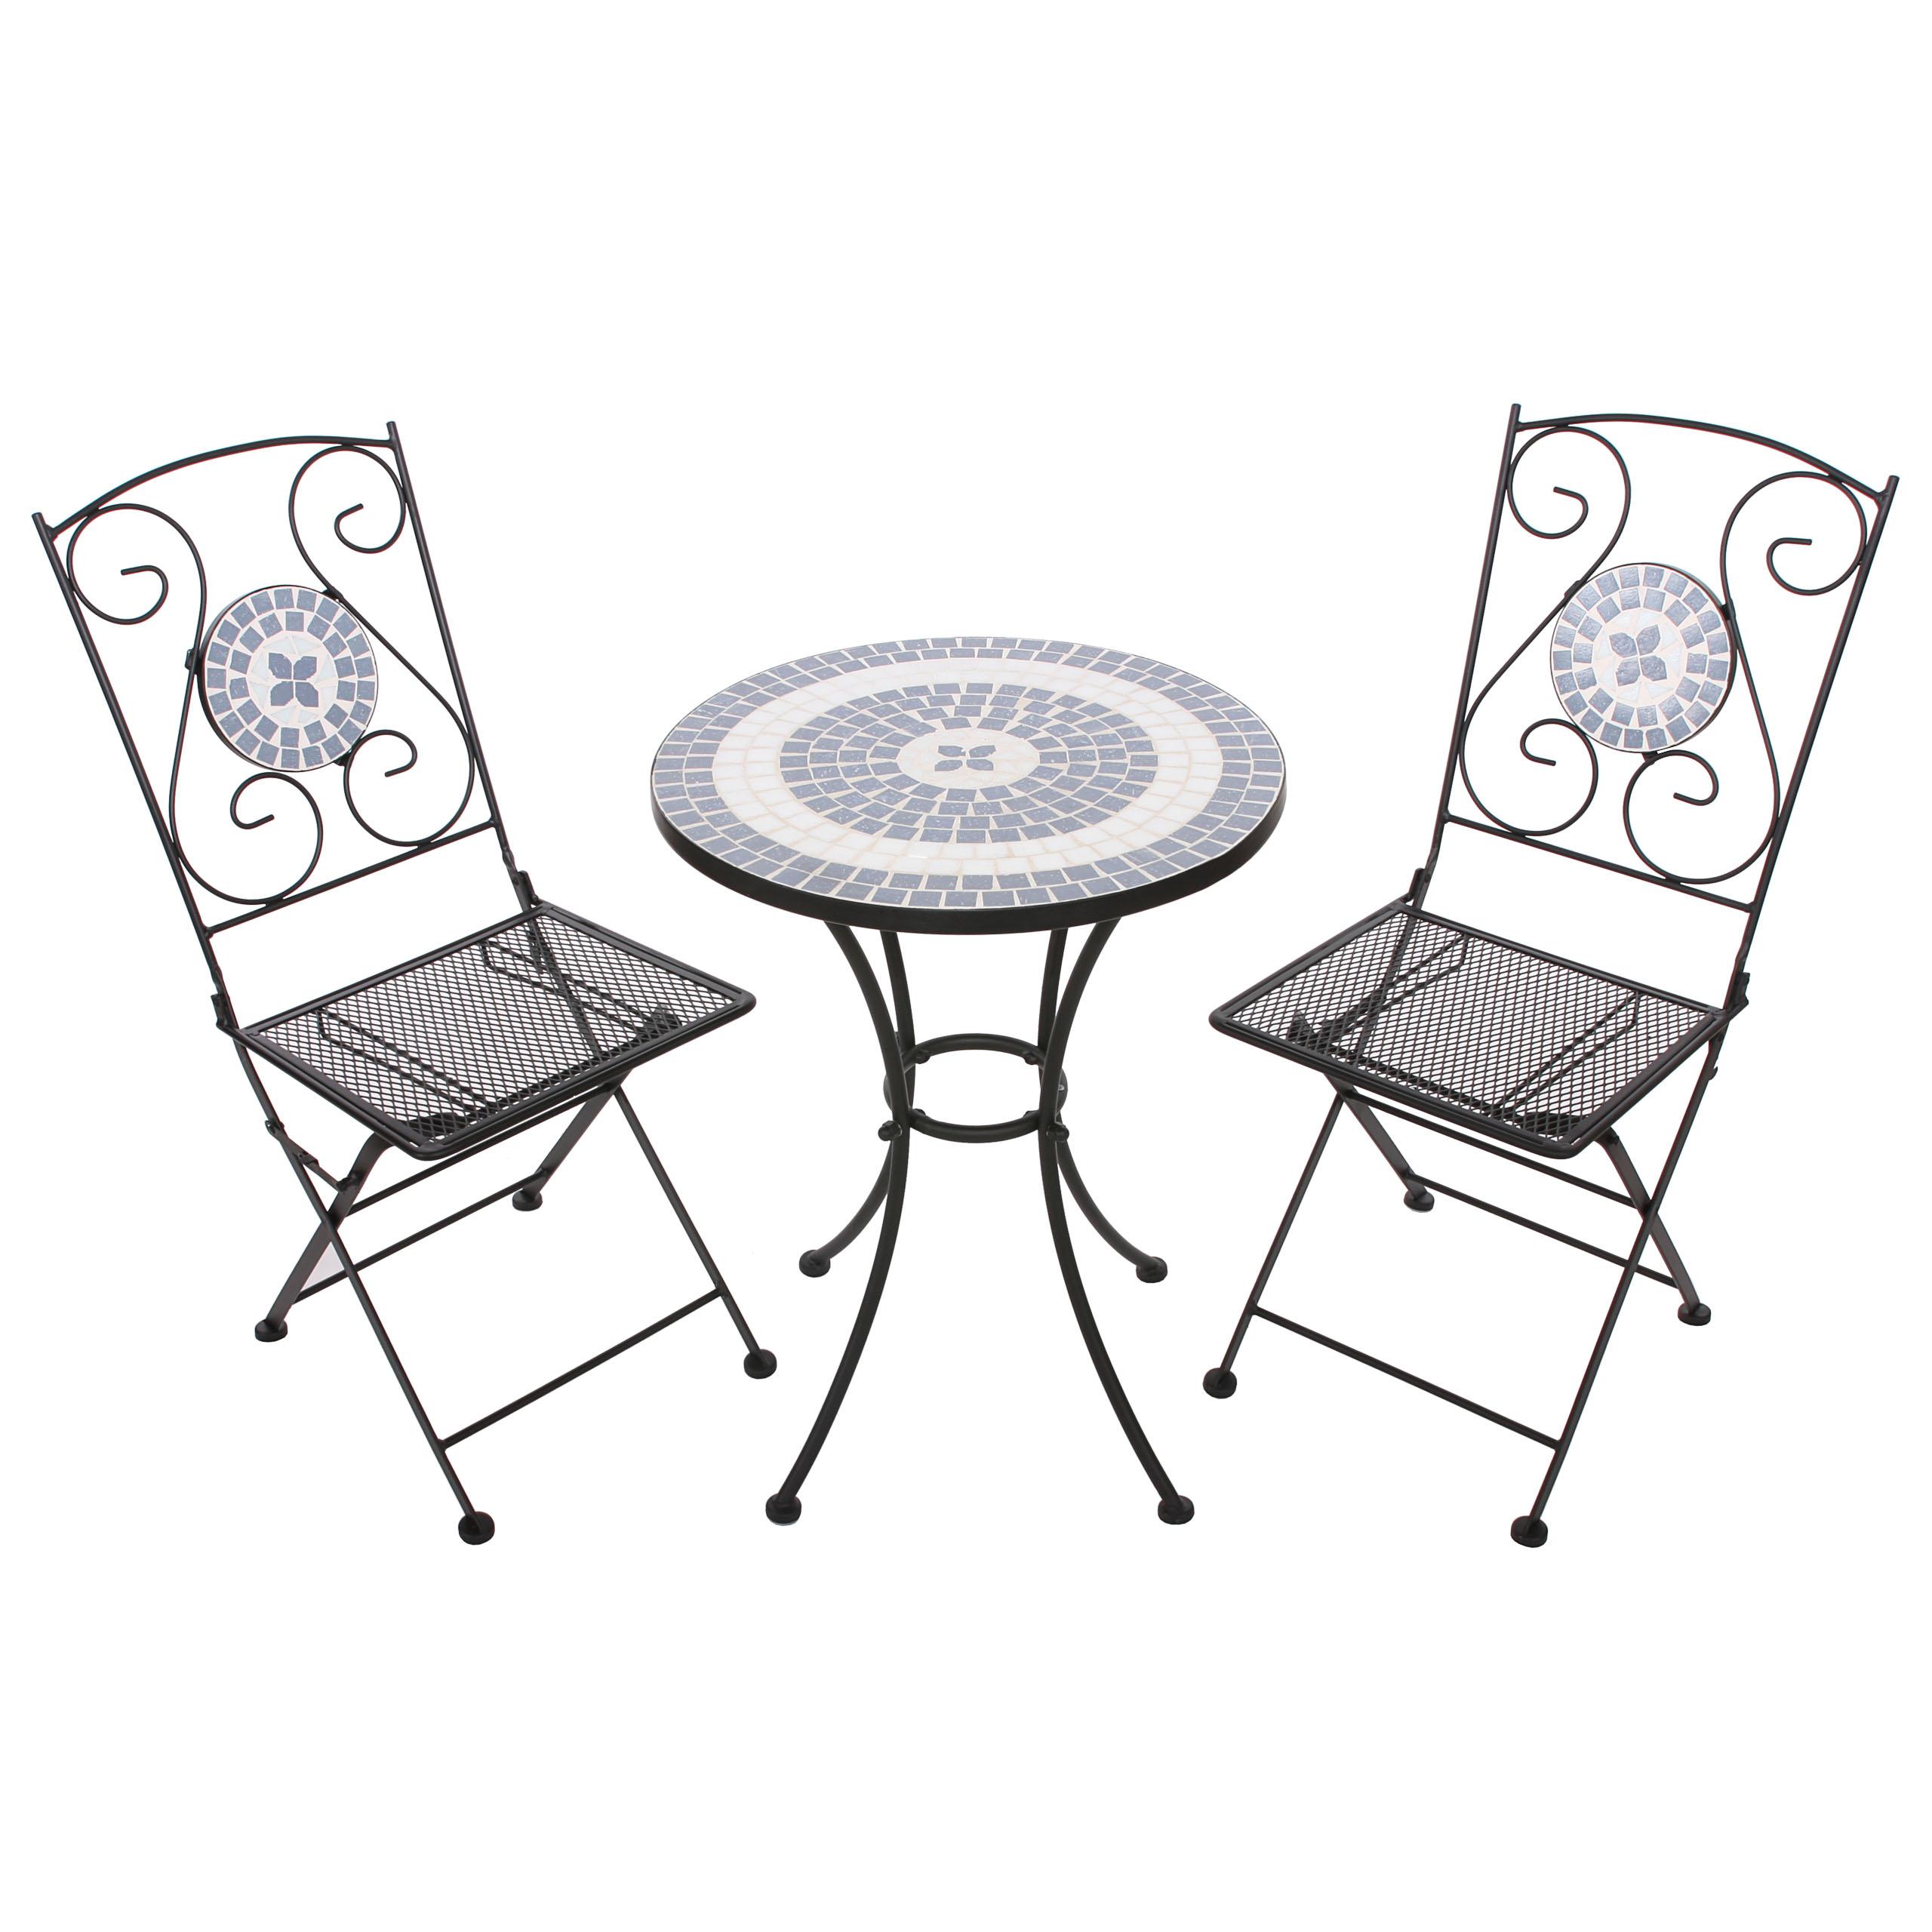 mosaik set gartengarnitur mosaiktisch 2x stuhl klappbar amora ebay. Black Bedroom Furniture Sets. Home Design Ideas